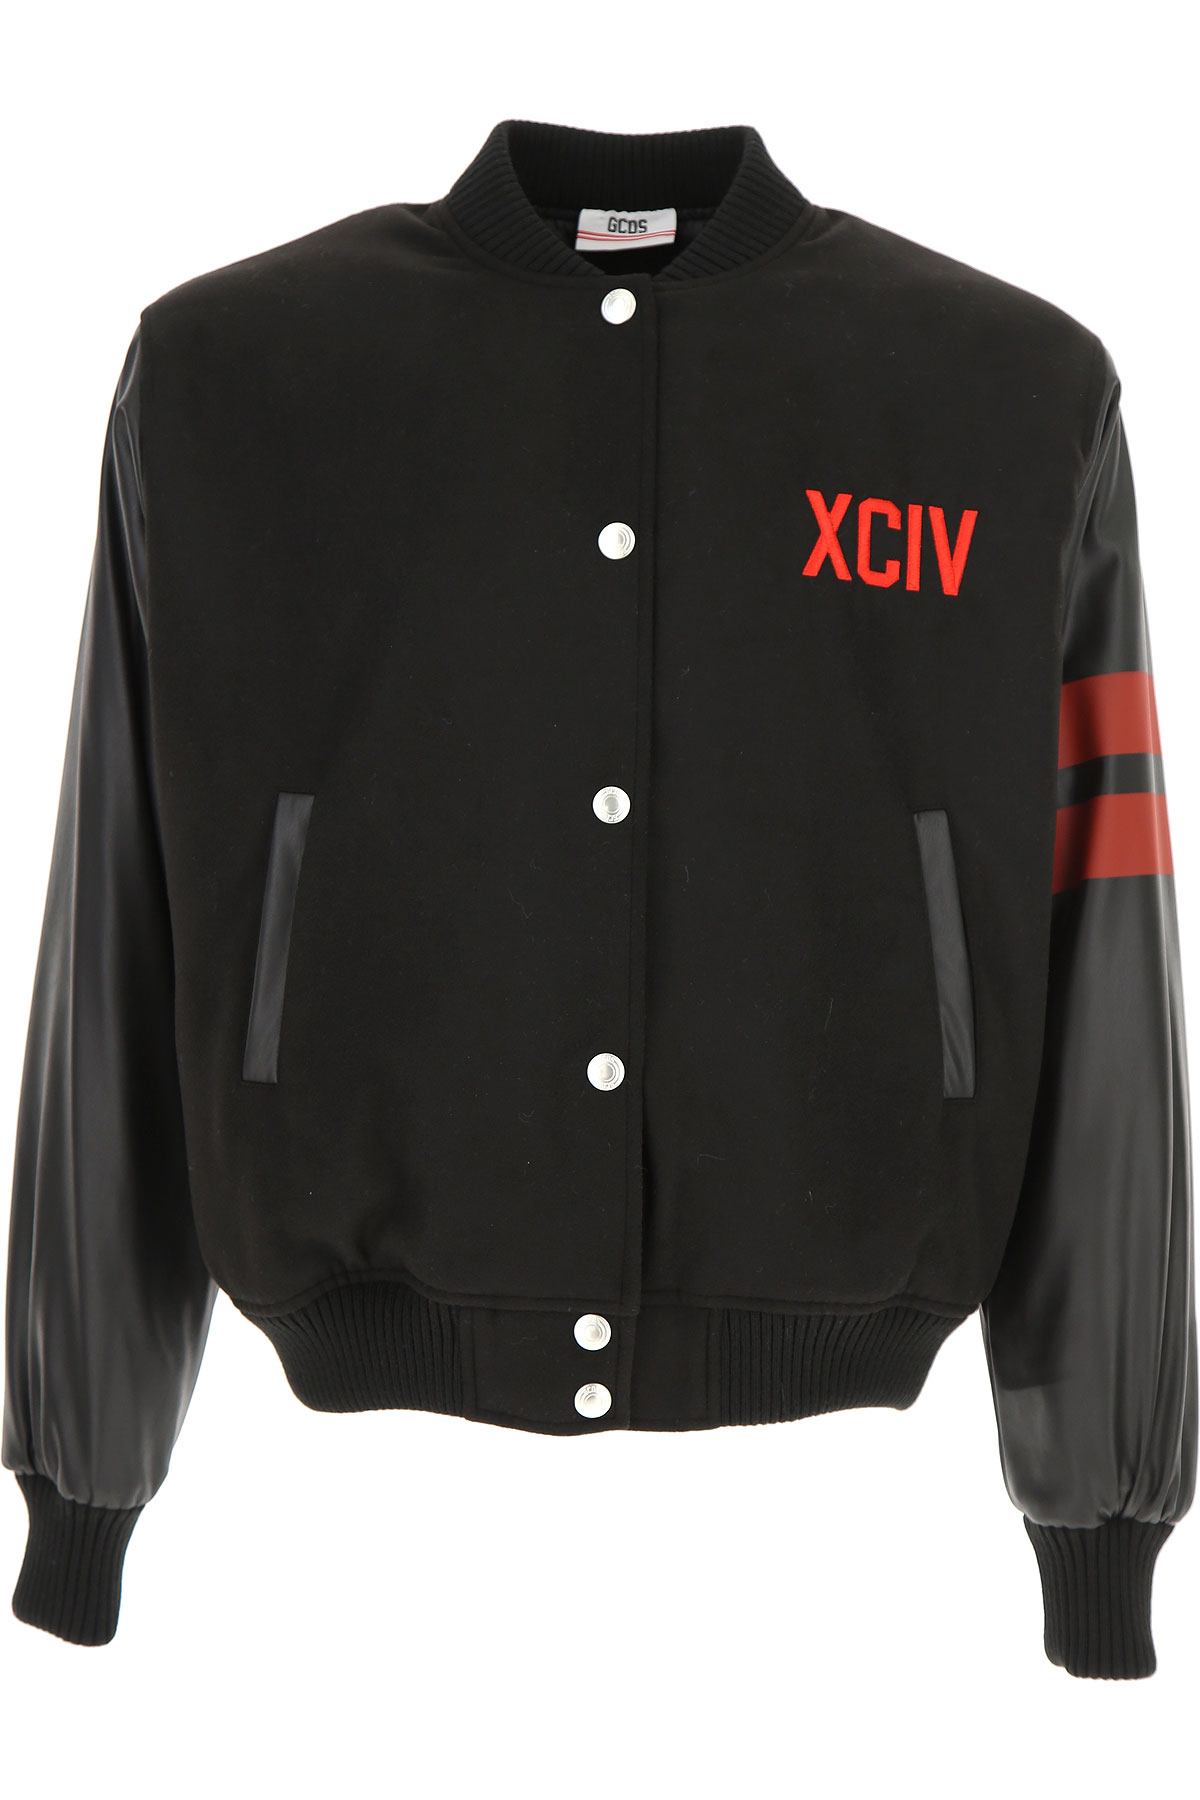 Image of GCDS Jacket for Men, Black, polyestere, 2017, L M S XL